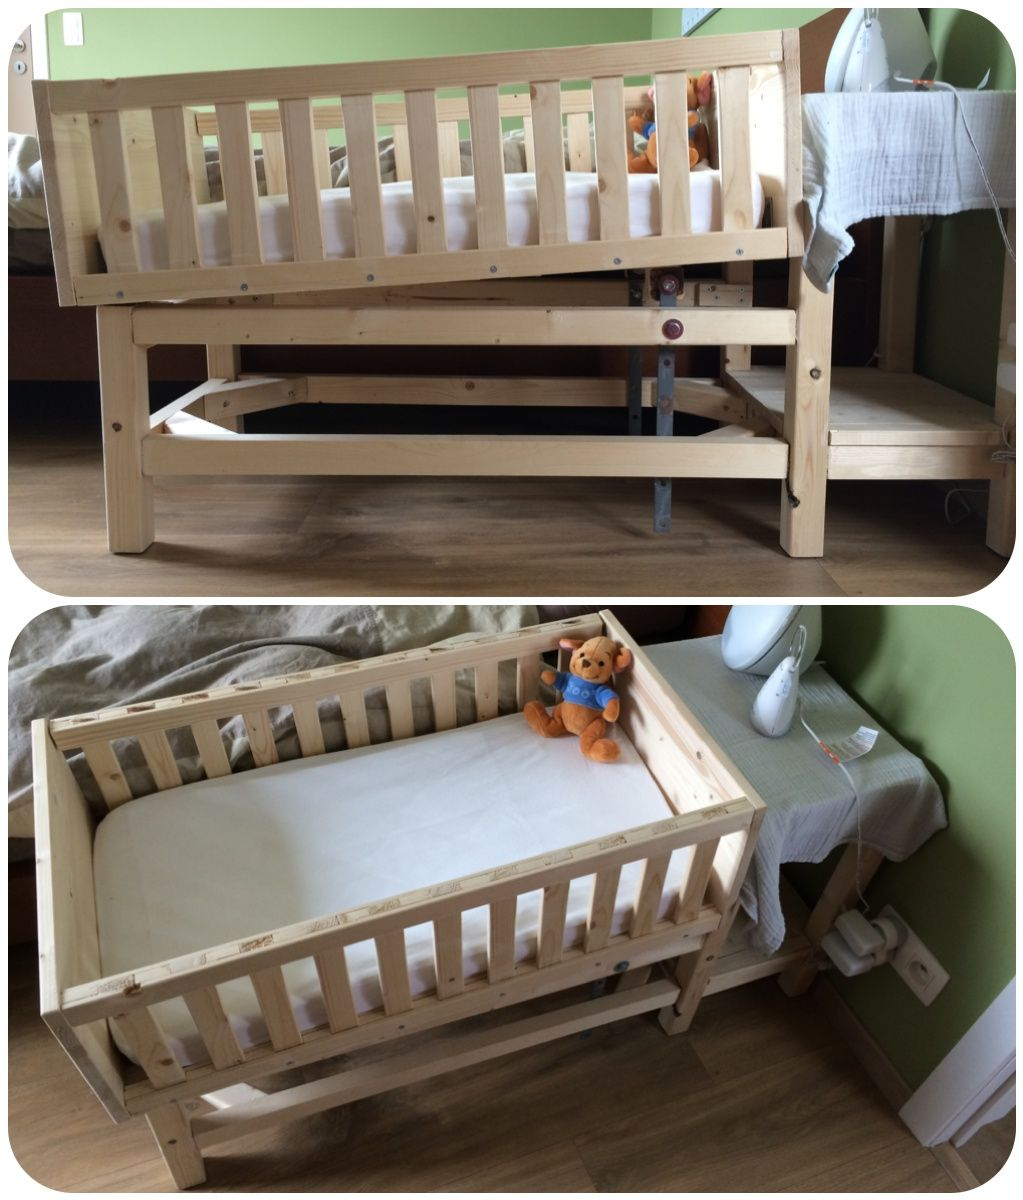 Crib for sale gatineau - Made With Love For Finn Diy Verstelbaar Baby Bedje Adjustable Baby Crib